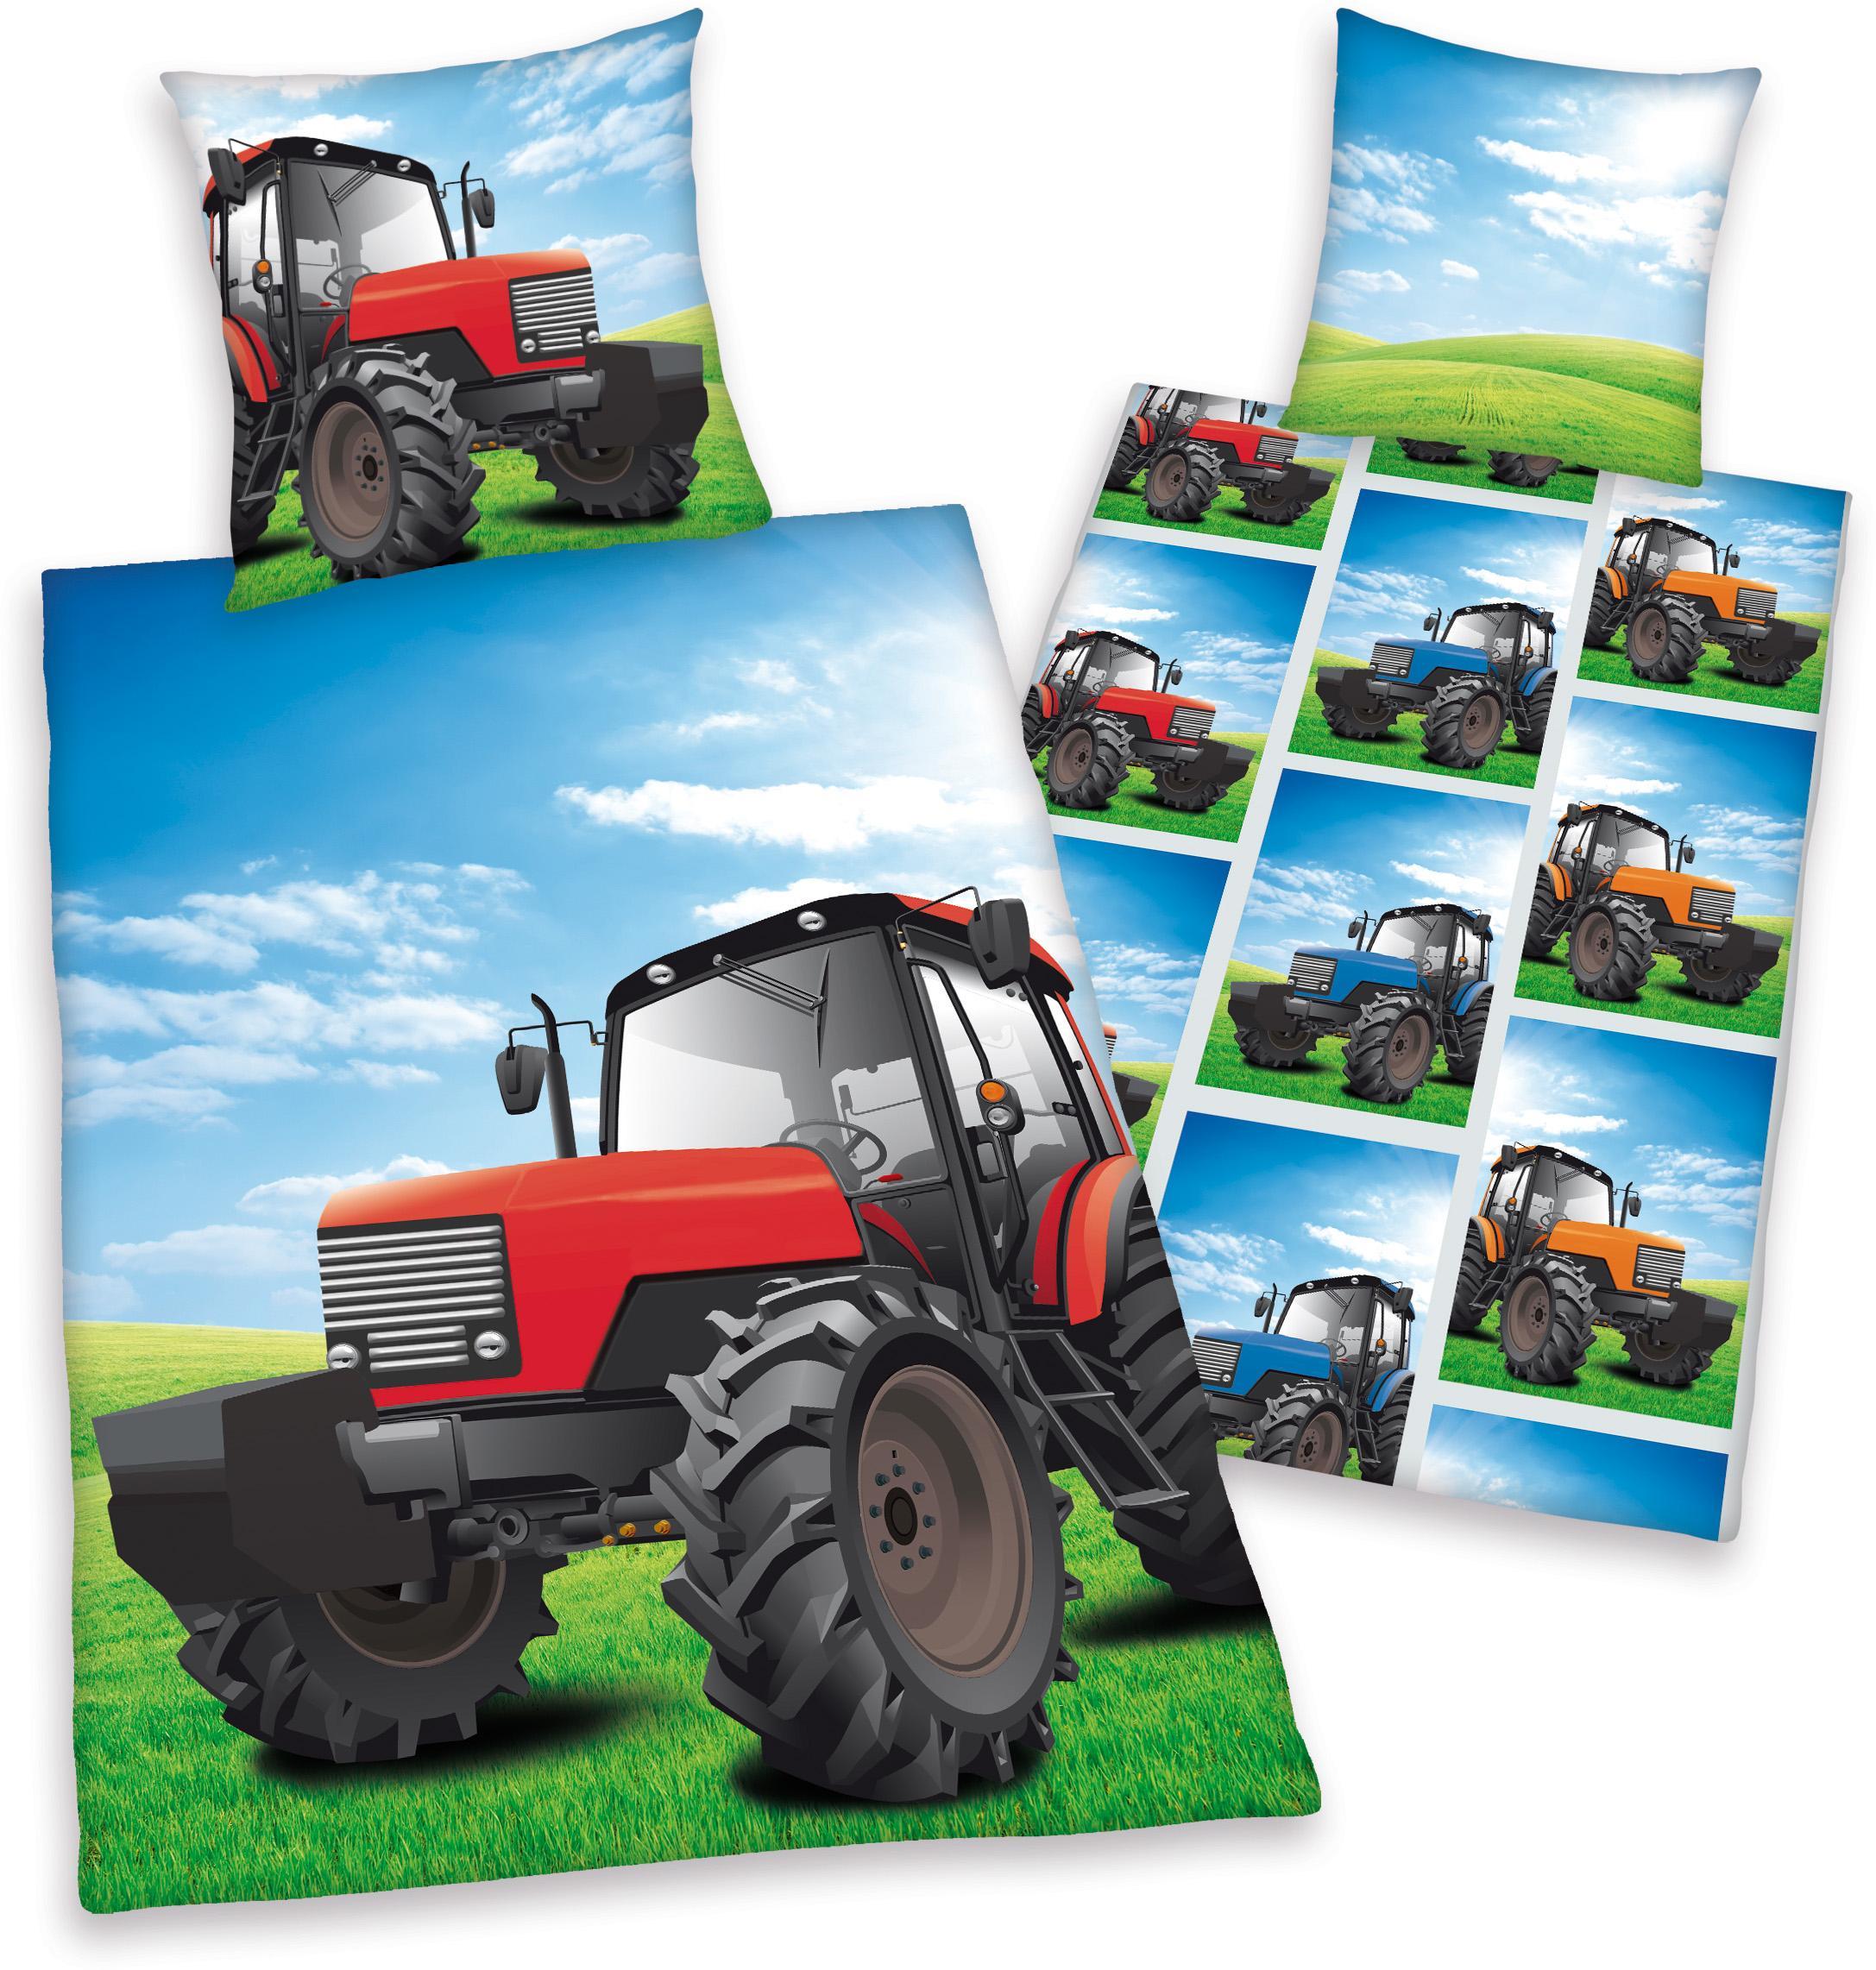 Kinderbettwäsche »Traktor«, Young Collection | Kinderzimmer > Textilien für Kinder > Kinderbettwäsche | Bunt | HERDING YOUNG COLLECTION